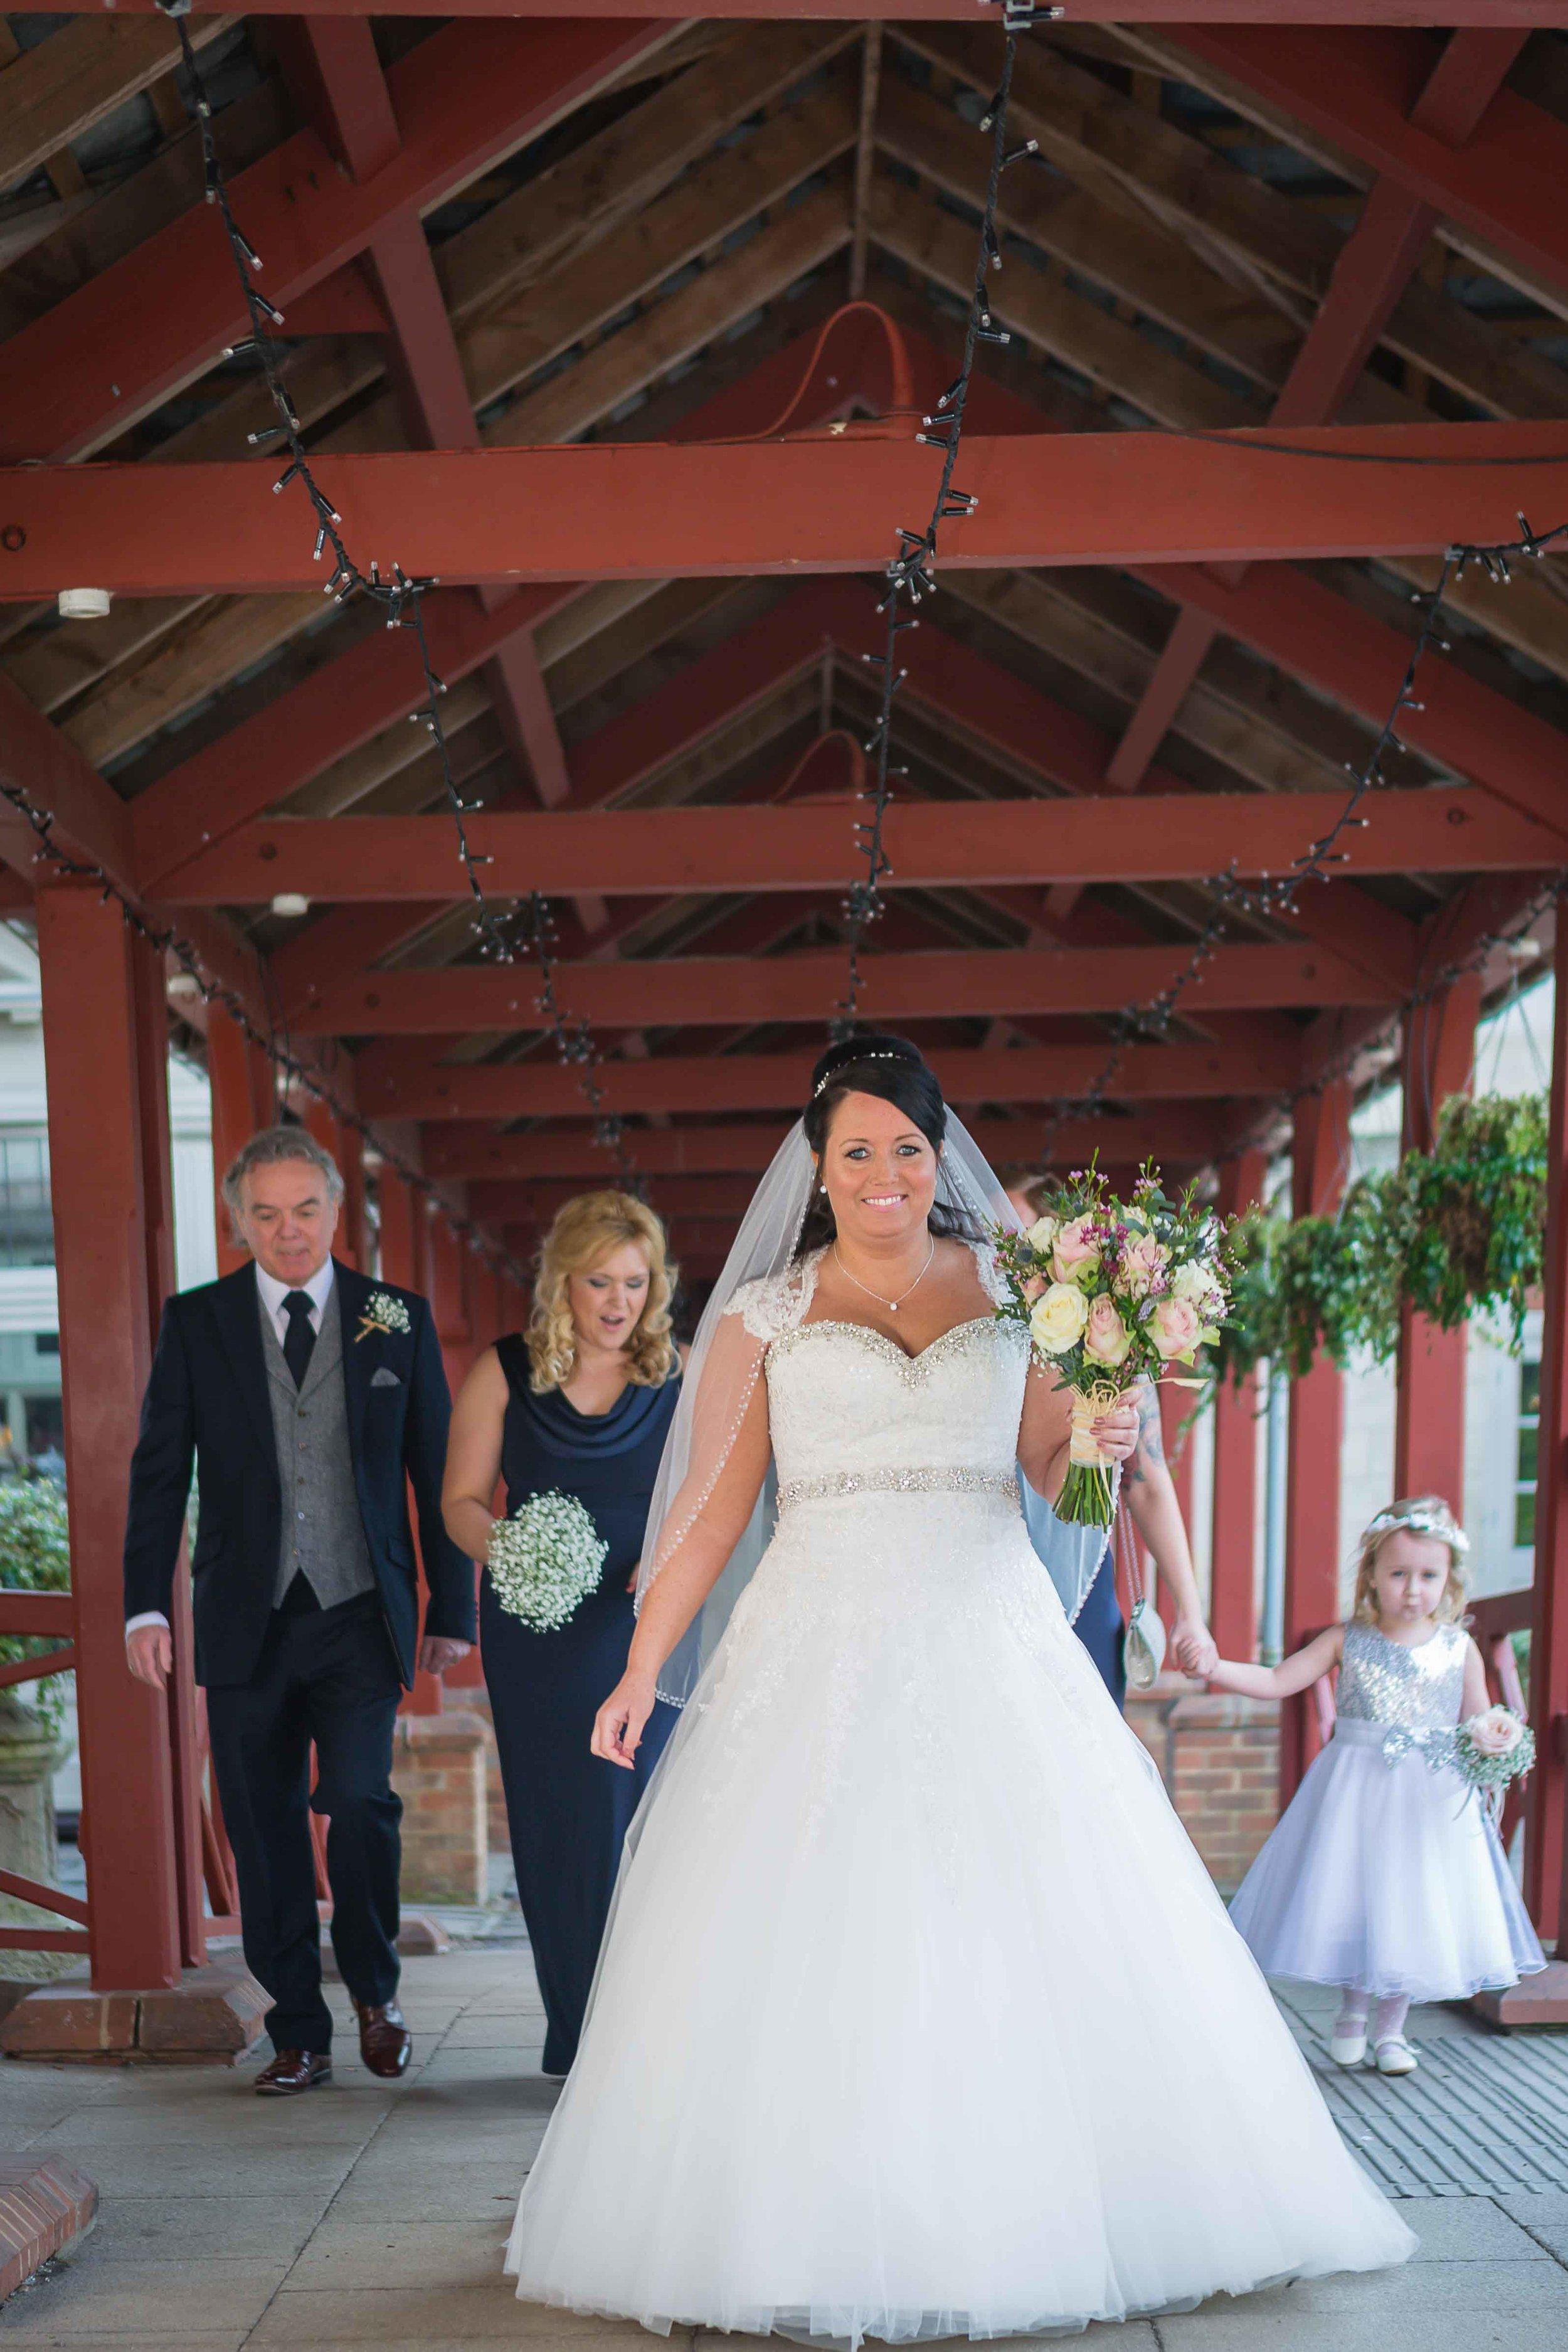 14.02.17 - Matt-Faye-Coombe-Abbey-Valentine-Wedding-Charnwood-Photography-1032.jpg